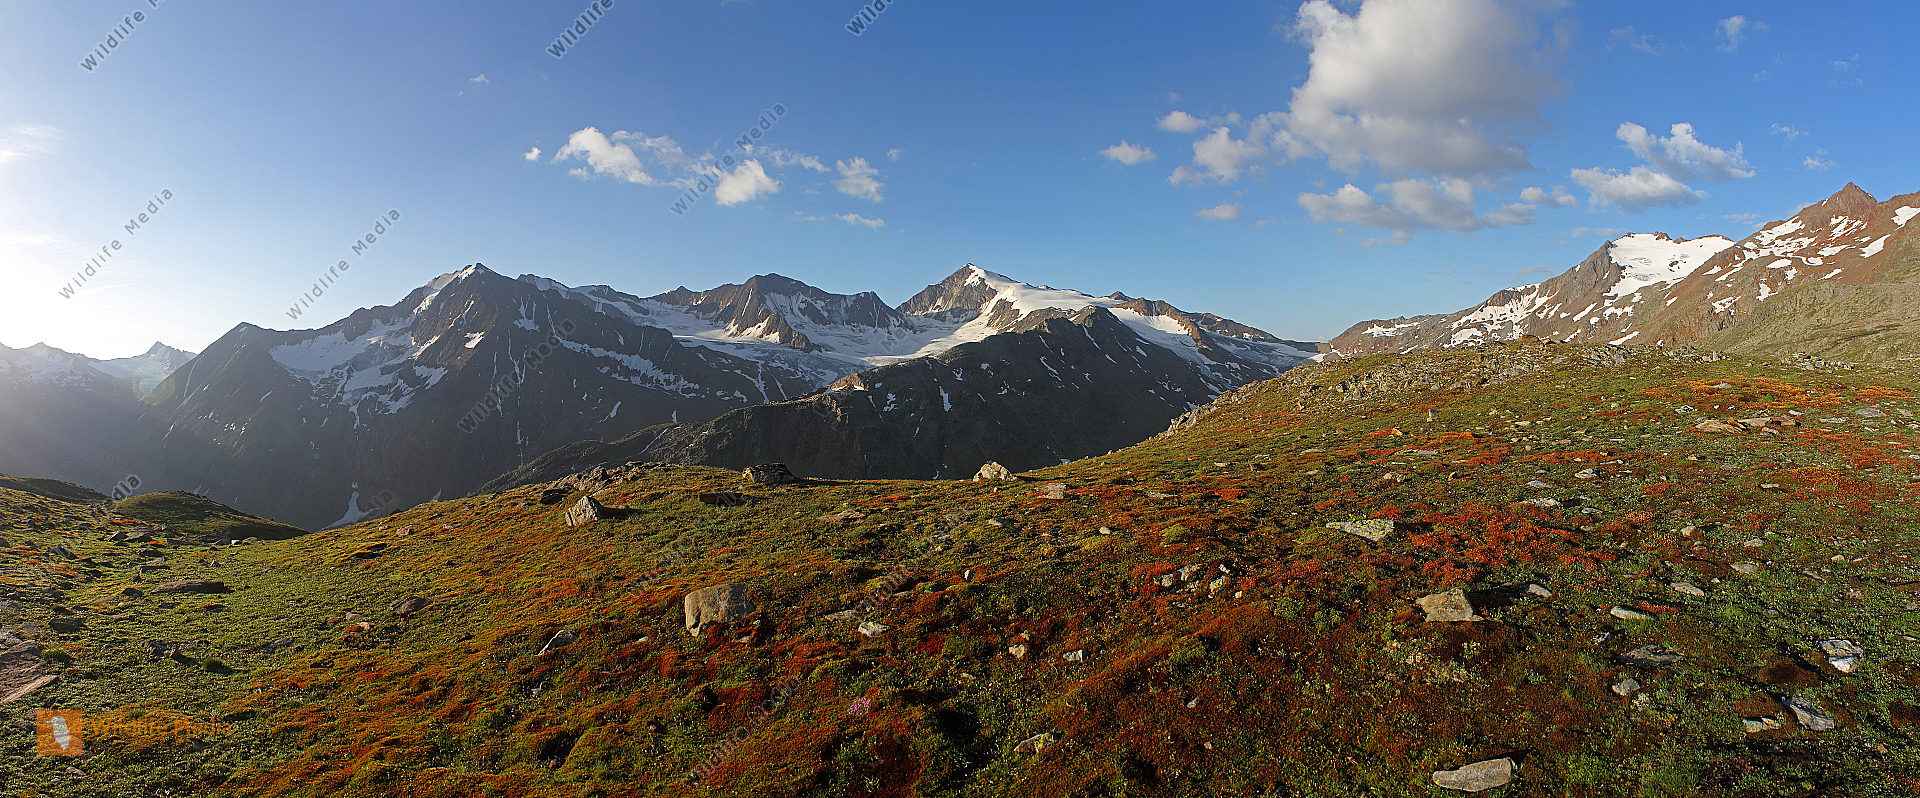 Similaun mit Ötztaler Alpen